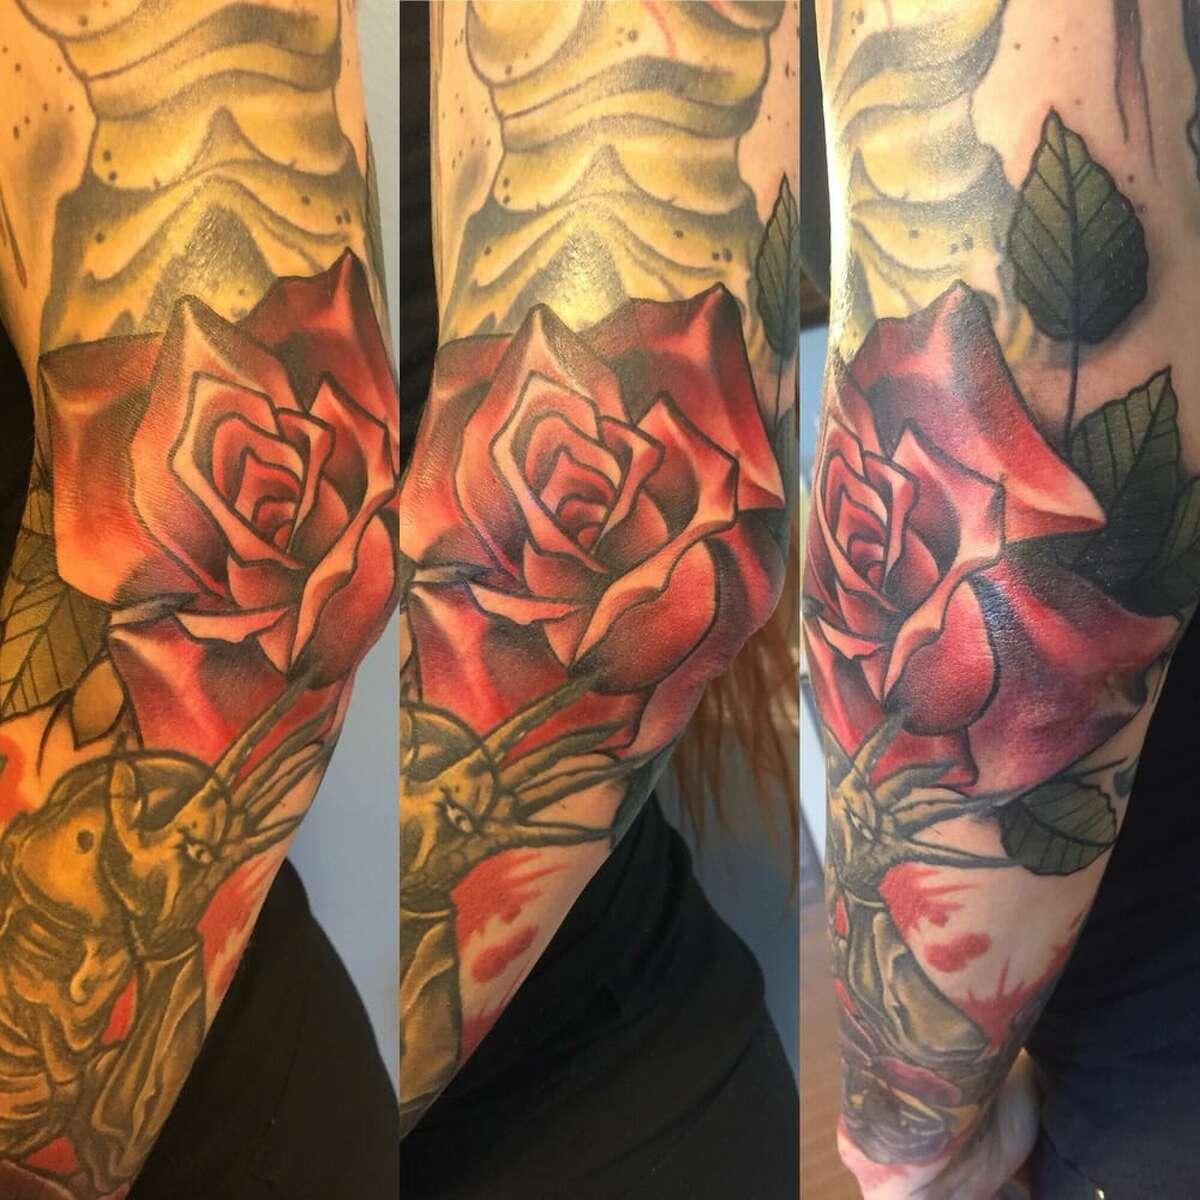 Red Shores Tattoo2909 Baldwin Street, Houston Yelp review by Jennifer K: